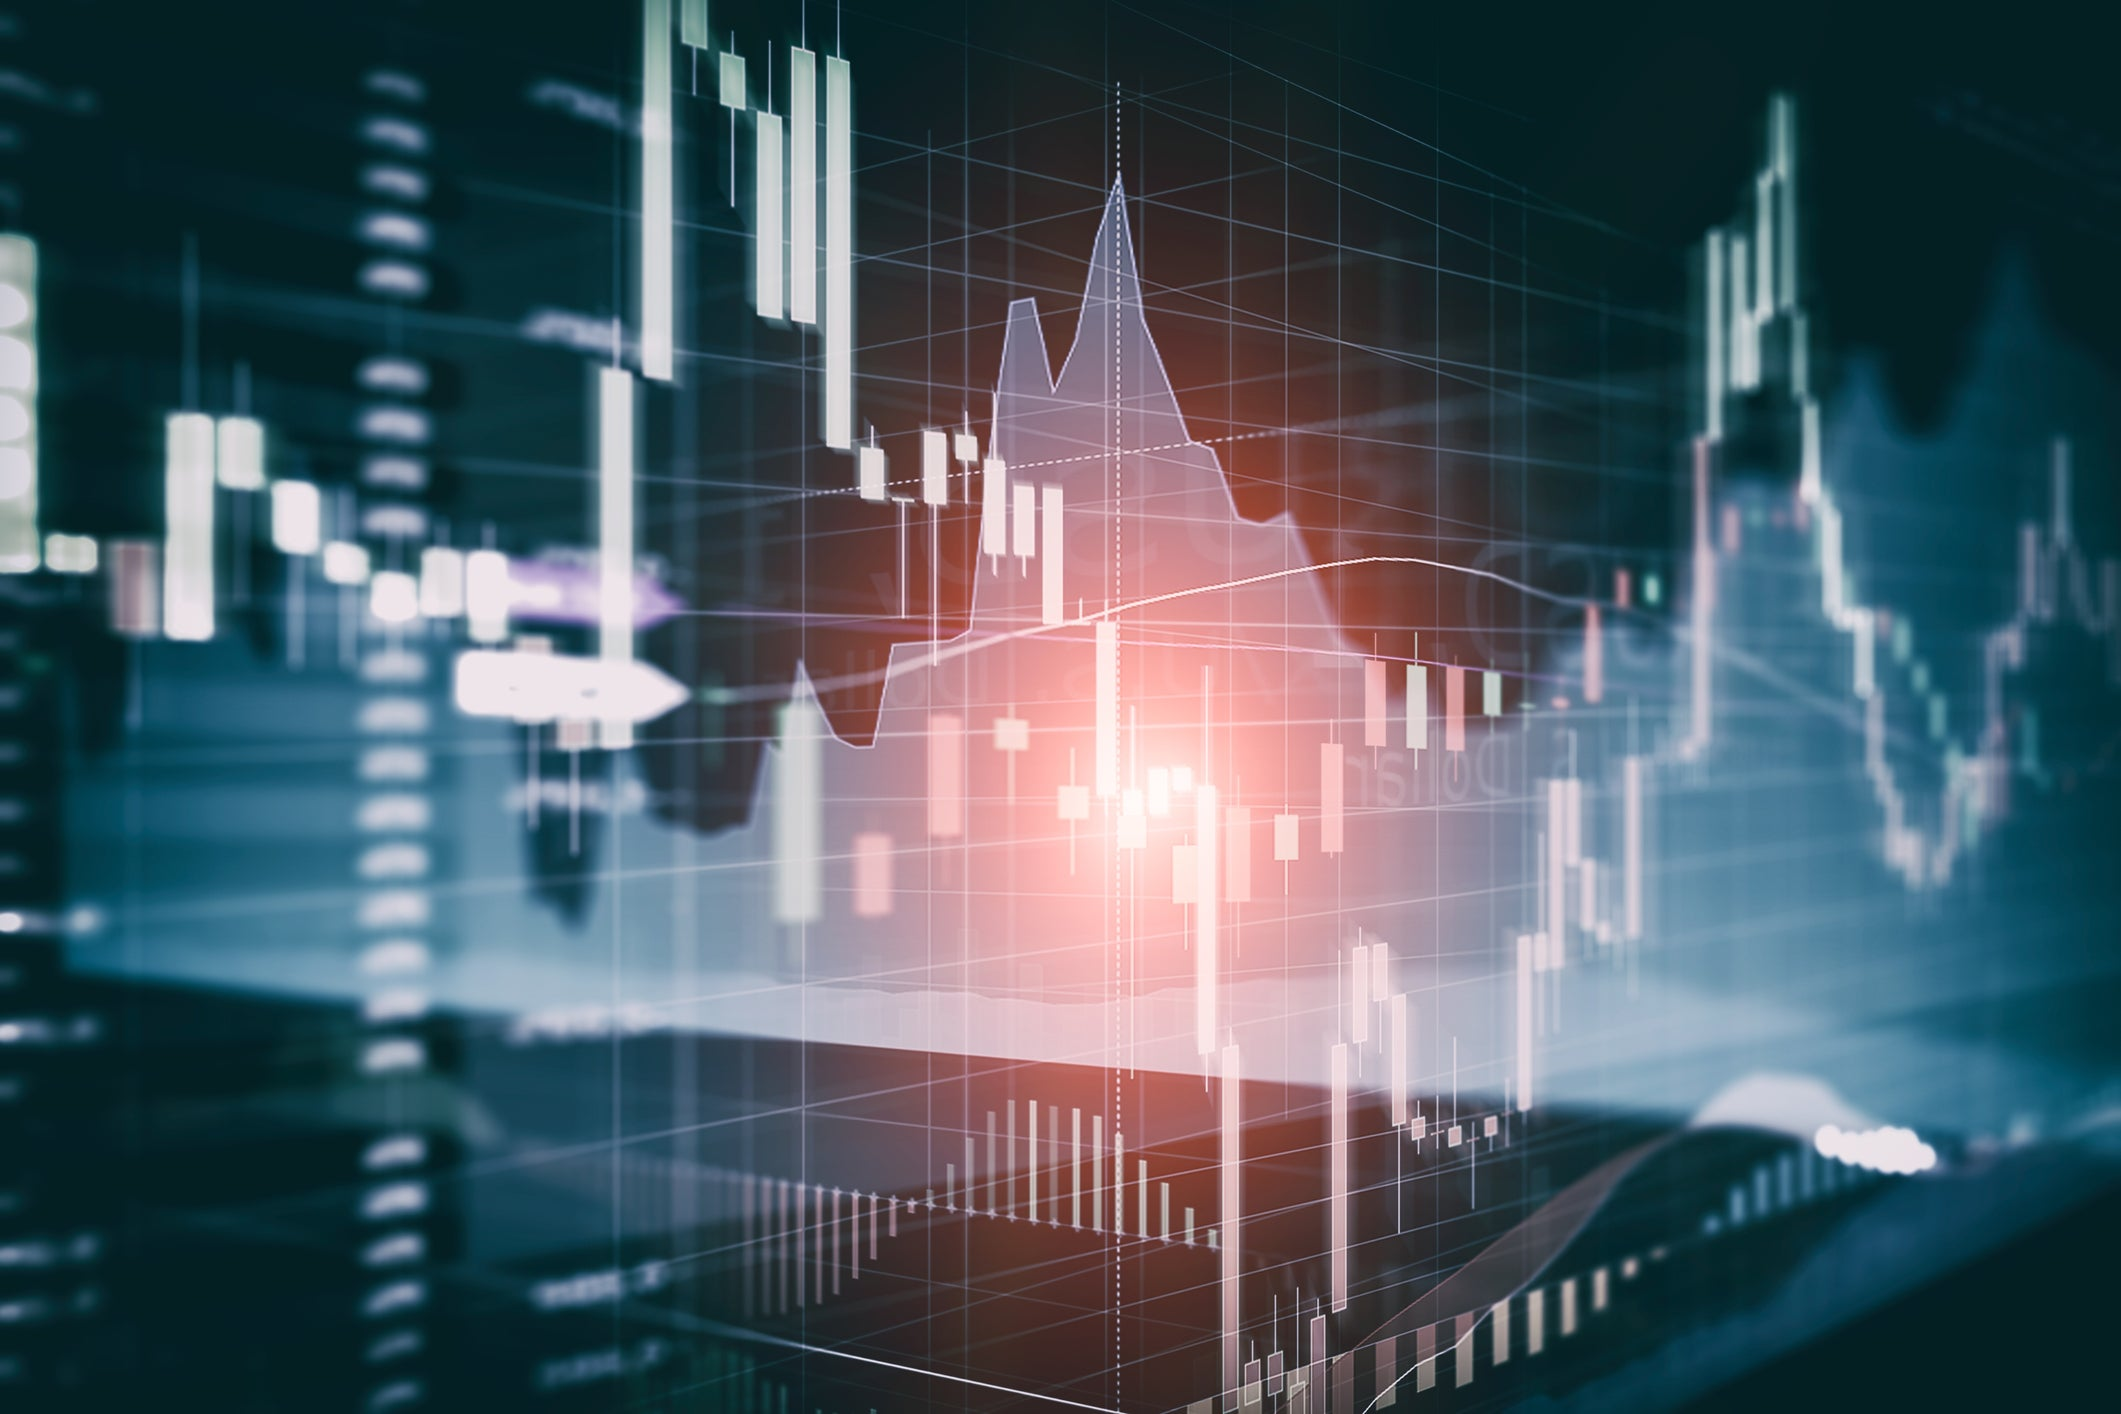 4 Top Vanguard Bond Funds The Motley Fool